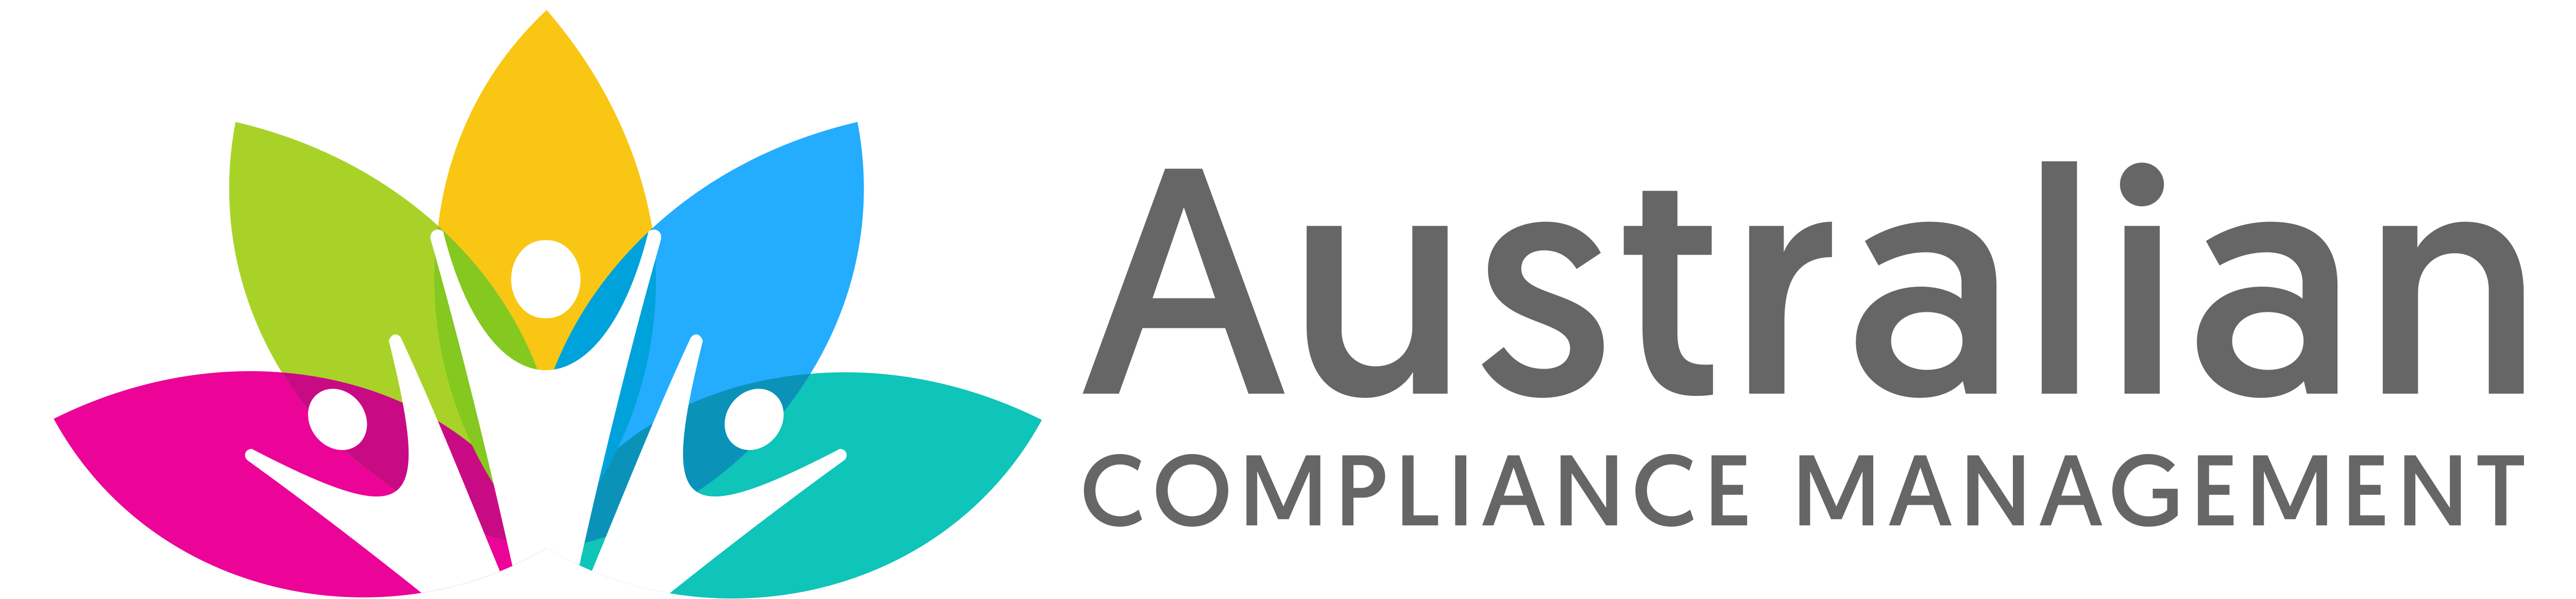 Australian Compliance Management logo